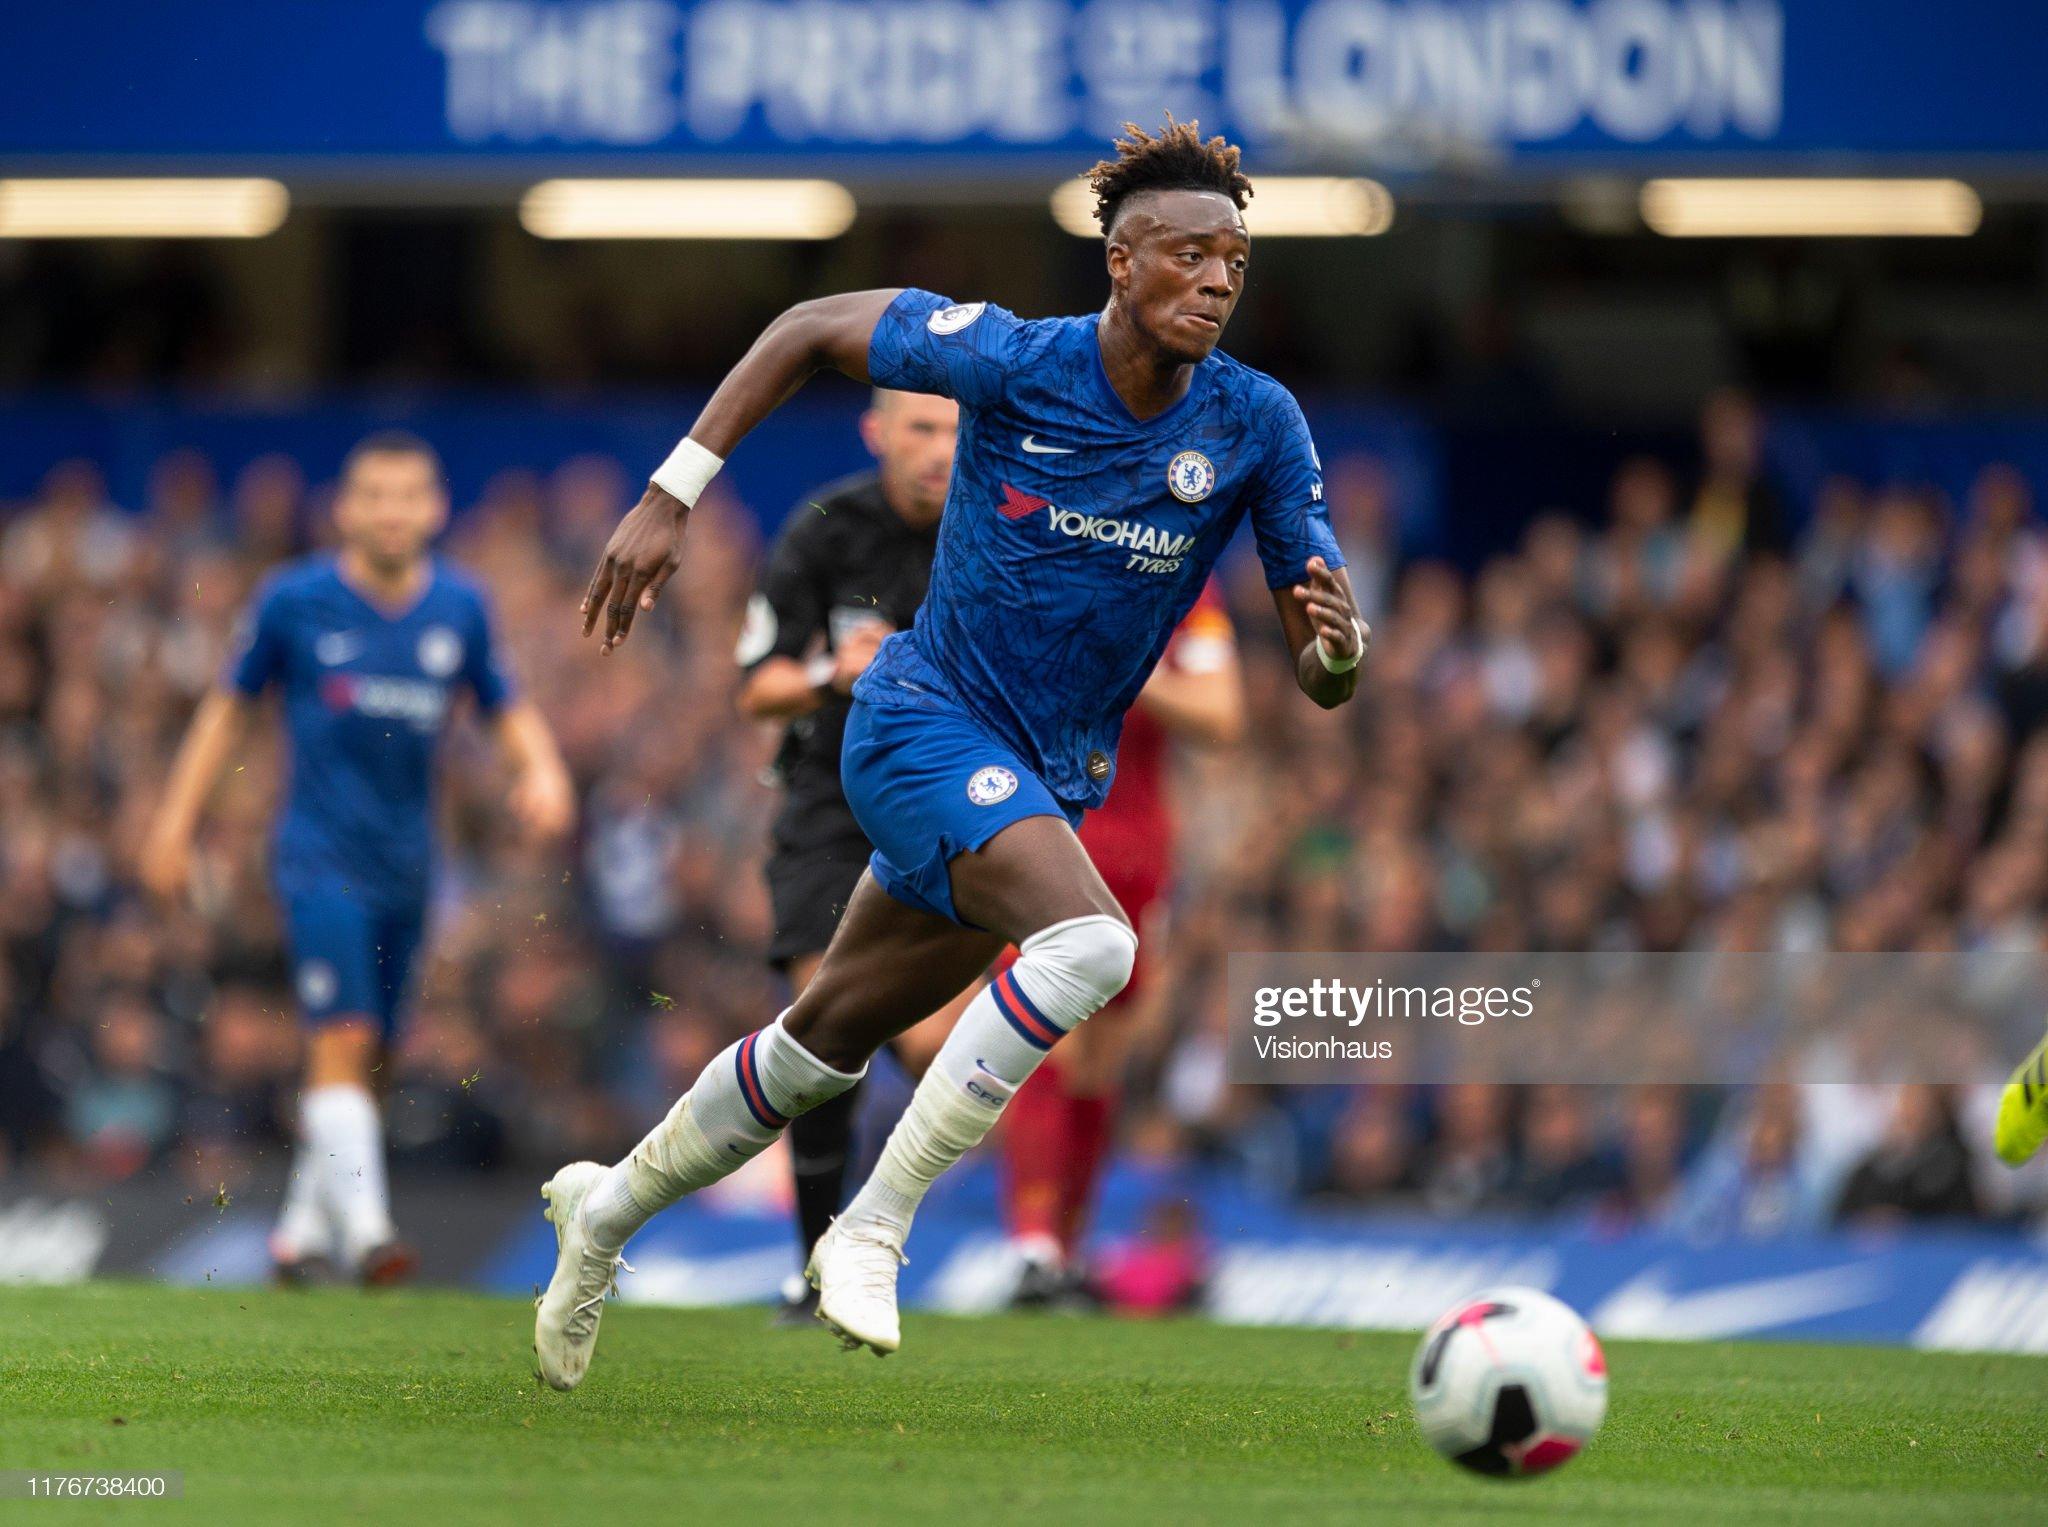 Fantasy Football ones to watch season 2019/20 gameweek seven